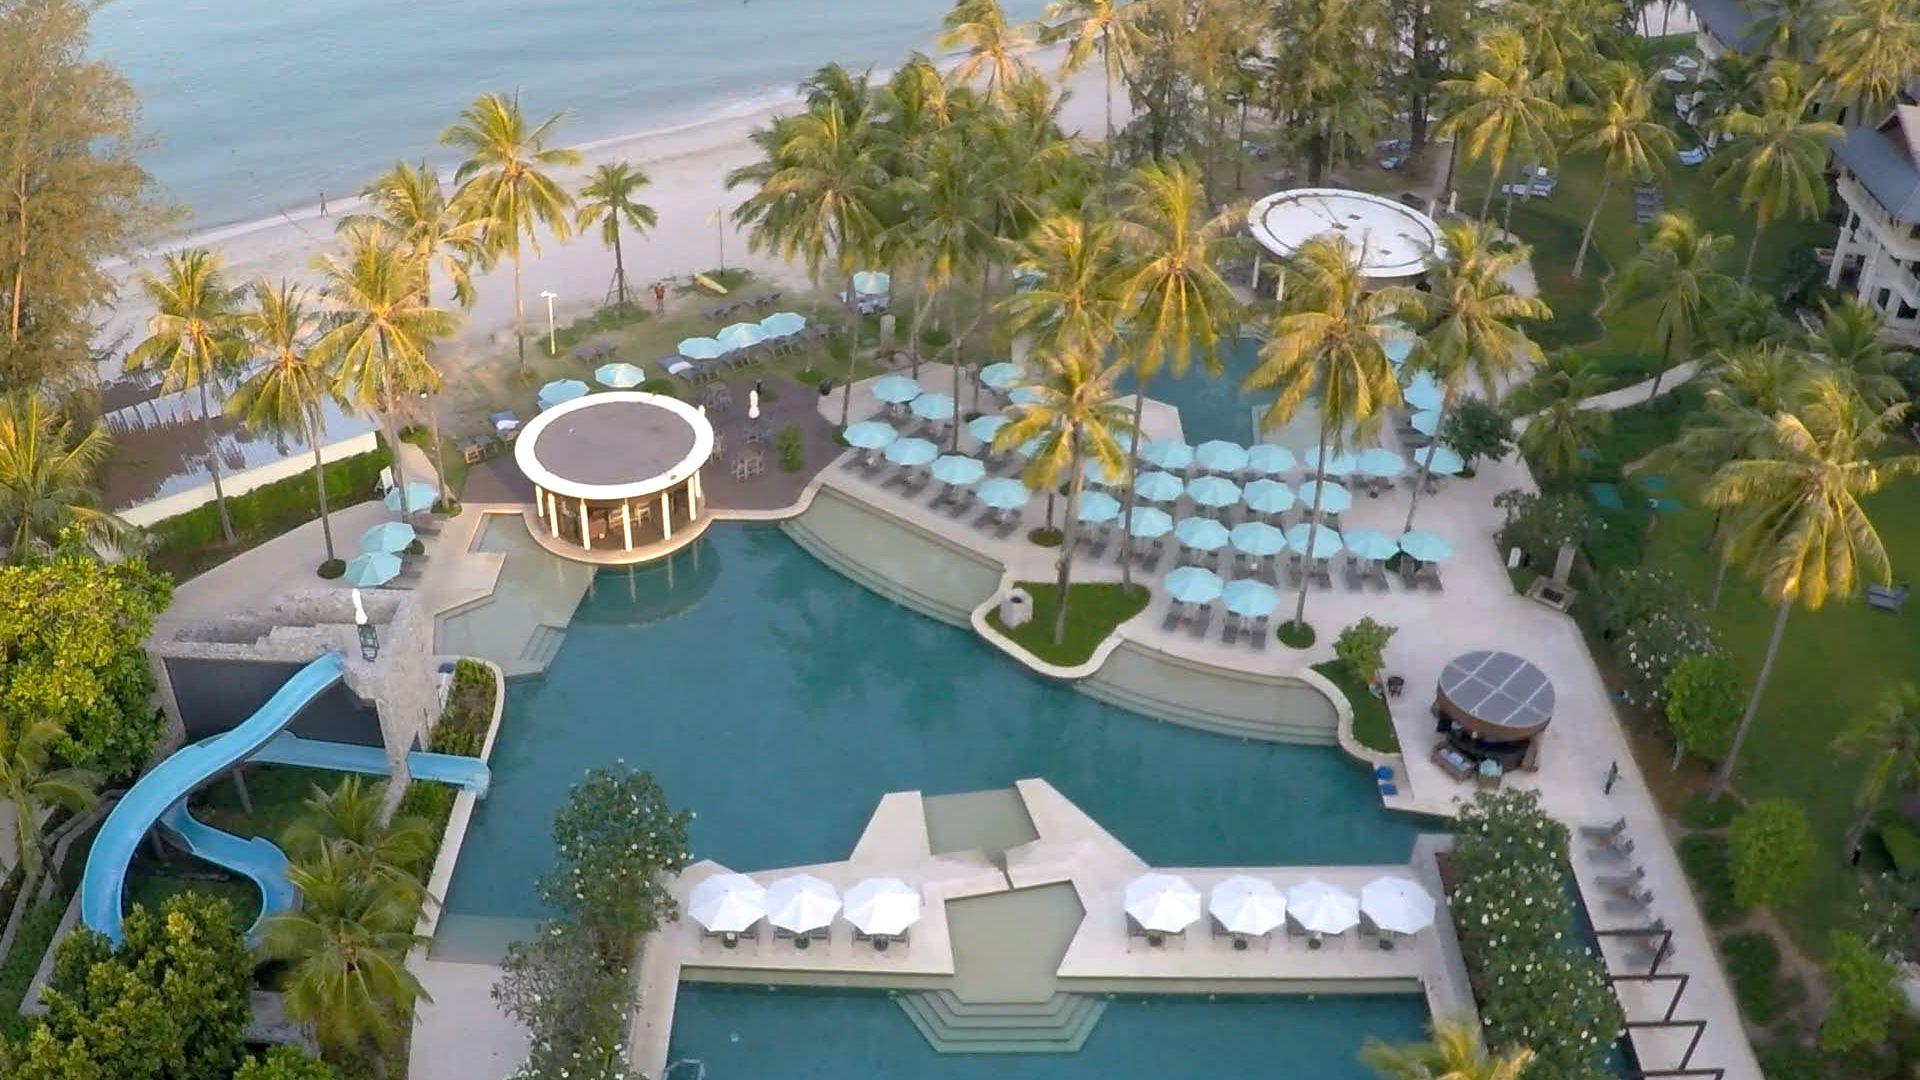 Family Hotels In Phuket - The outrigger laguna phuket beach resort has won best luxury family hotel southeast asia